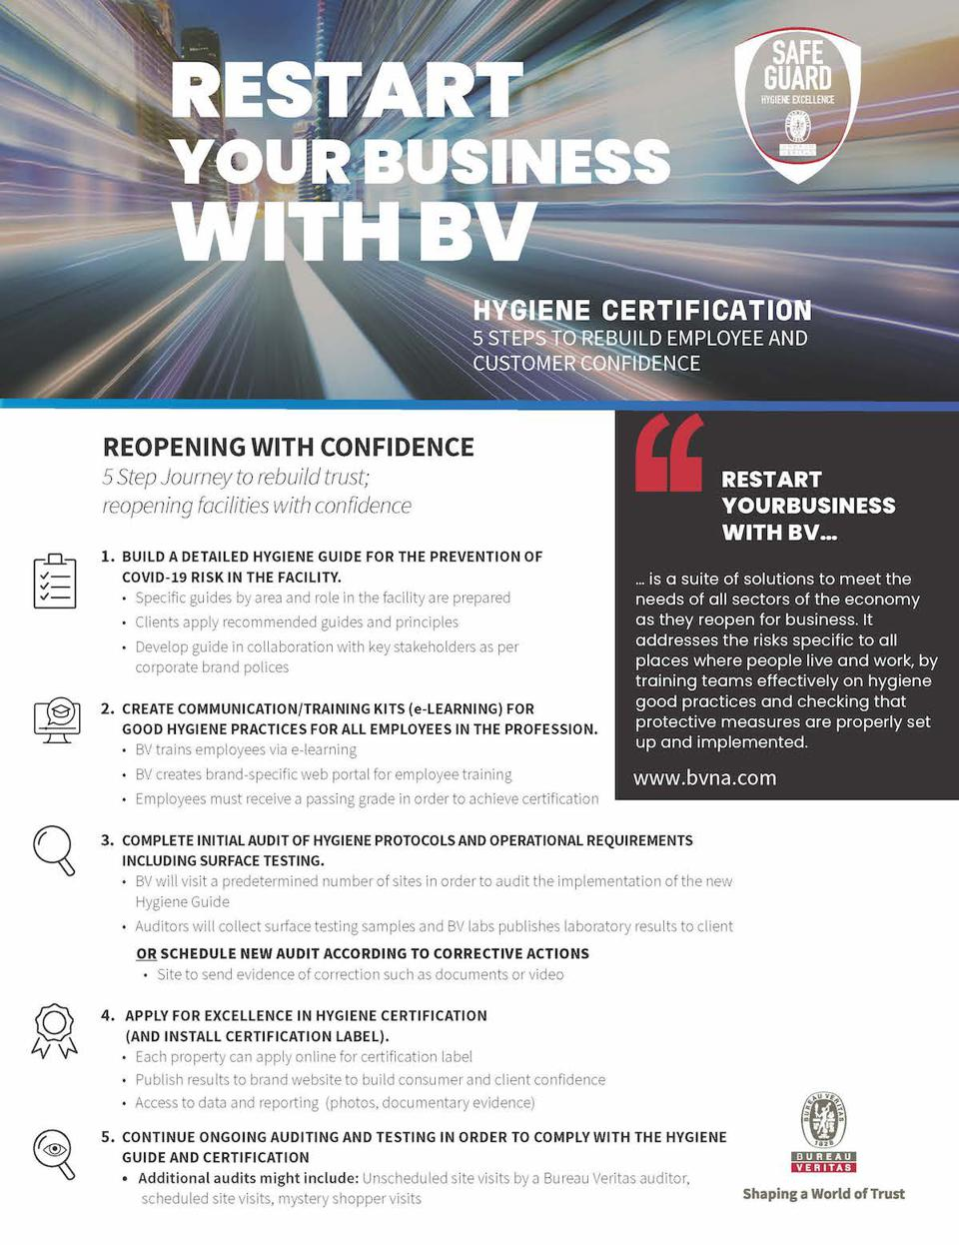 Bureau Veritas, Cleveland Clinic, pandemic, coronavirus, COVID-19, economy, business